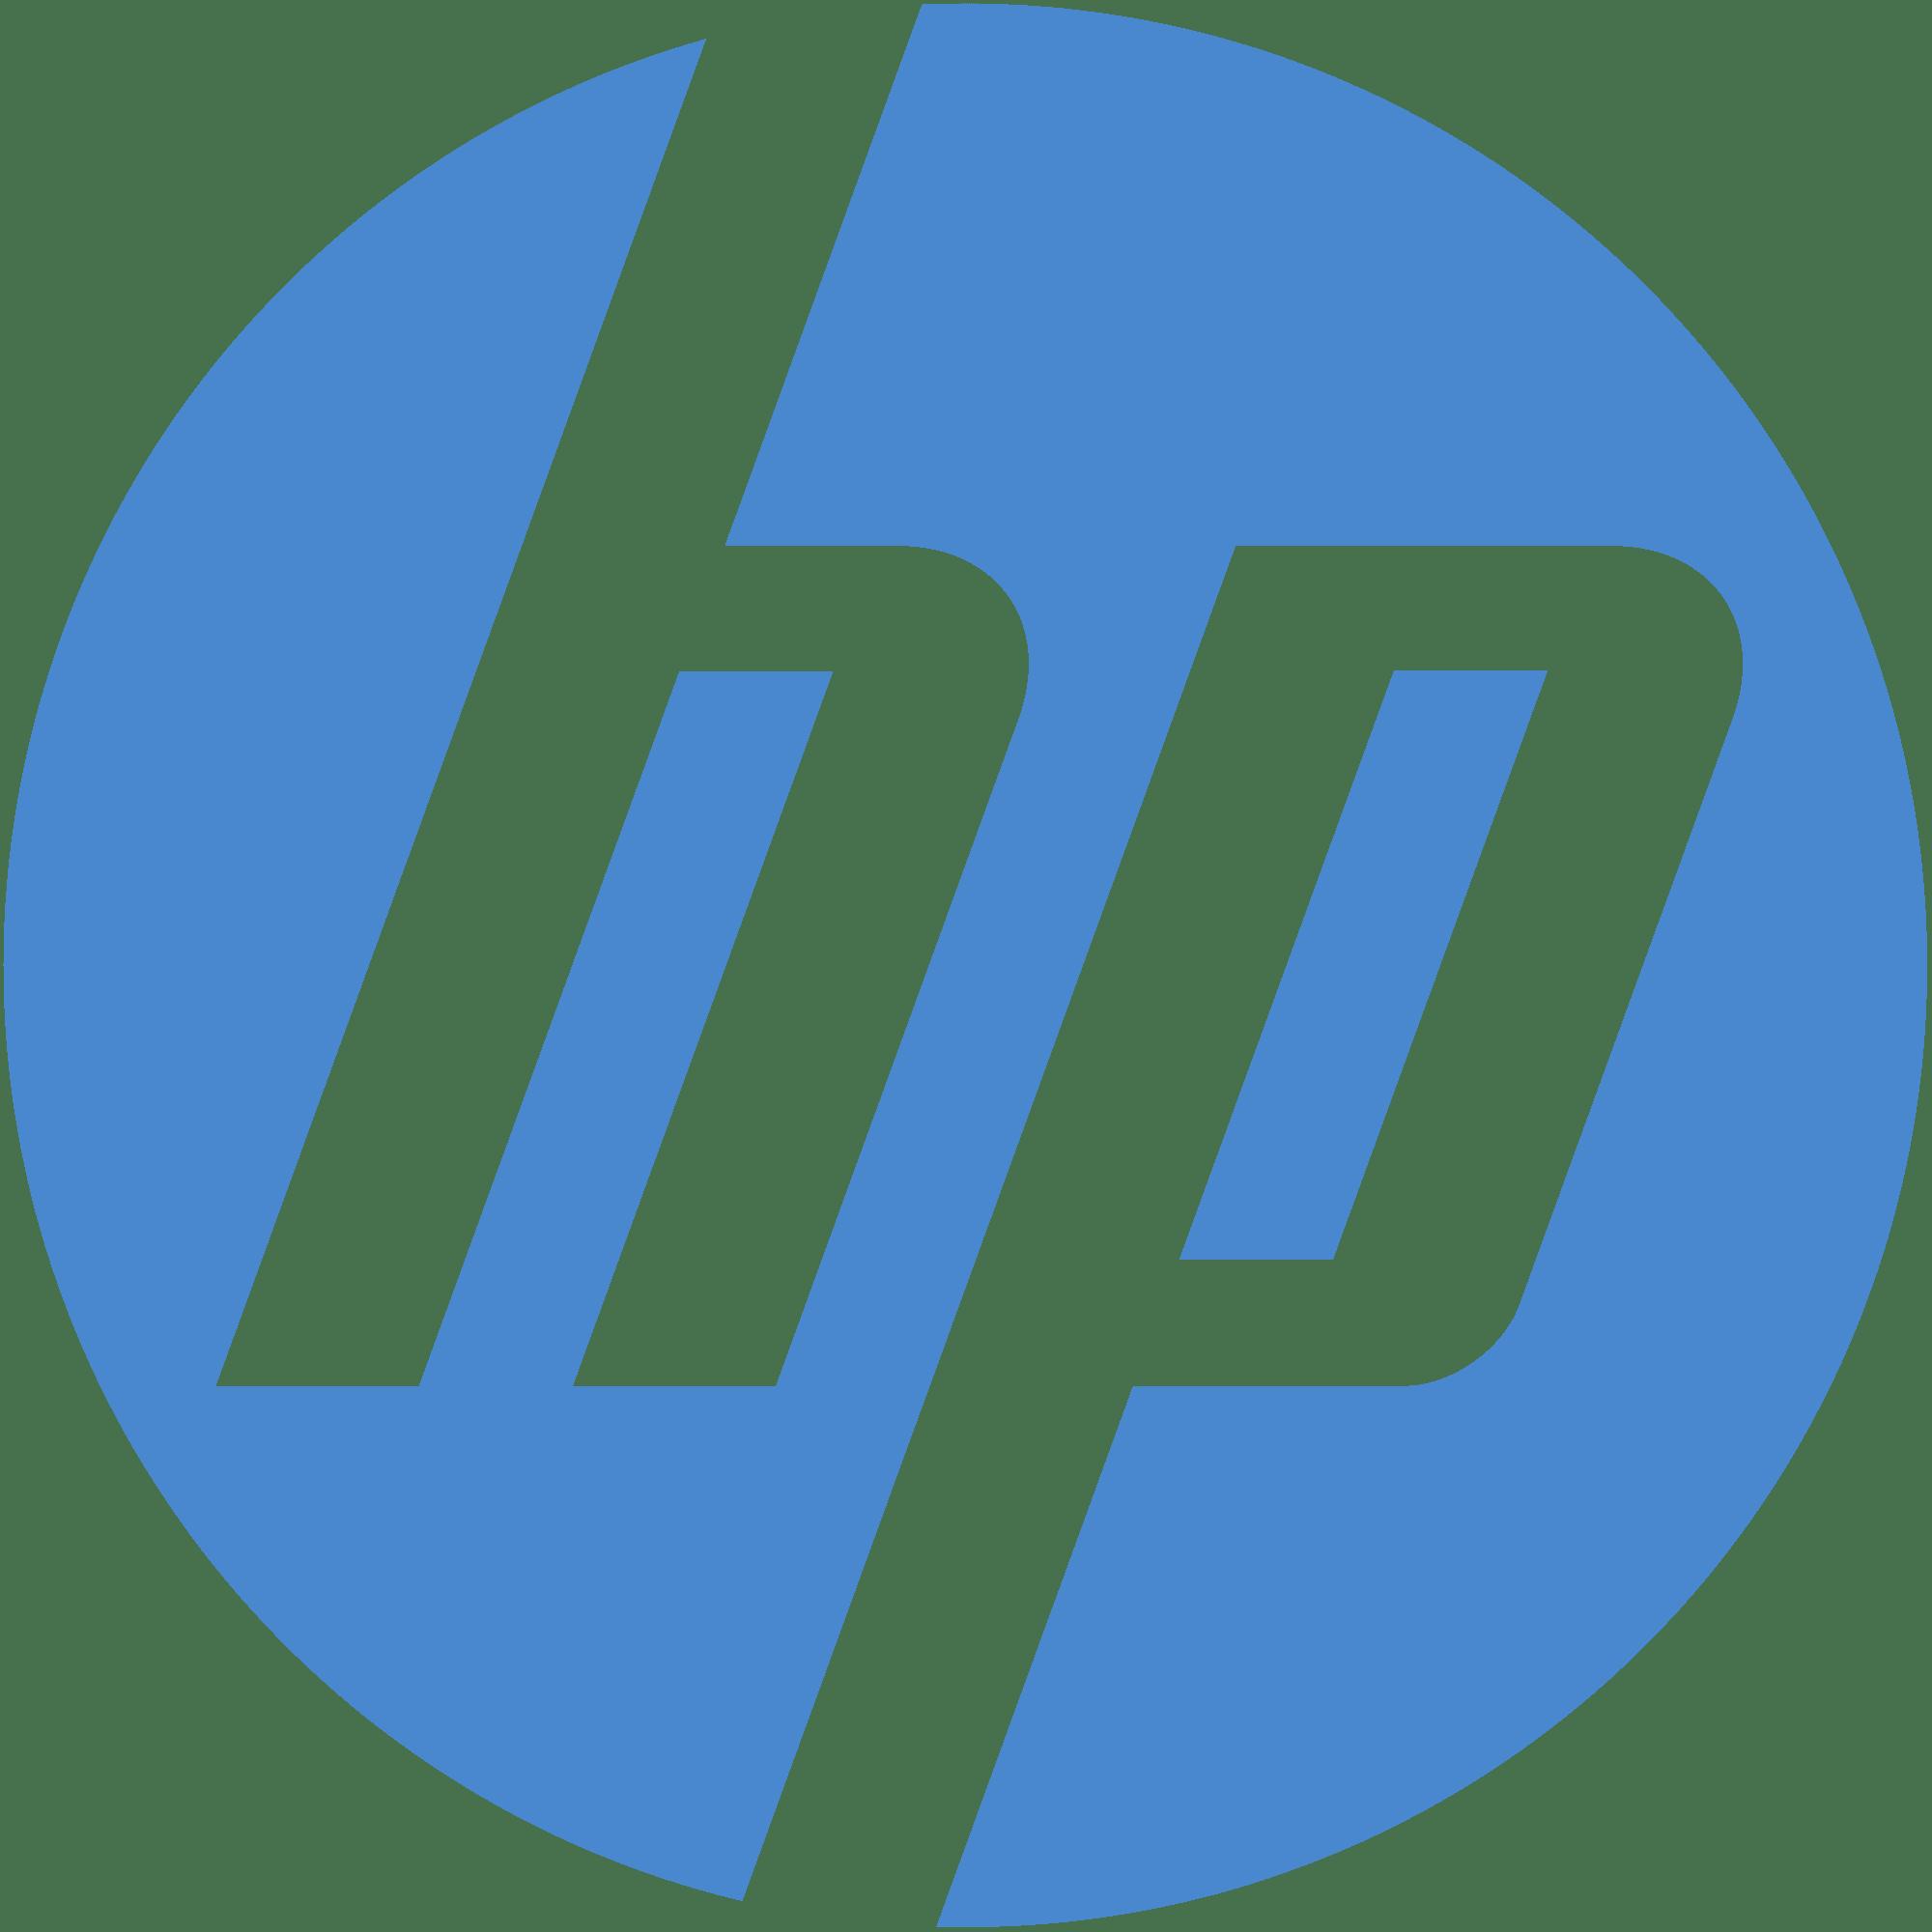 HP Pavilion TouchSmart 14-b132tx Sleekbook drivers